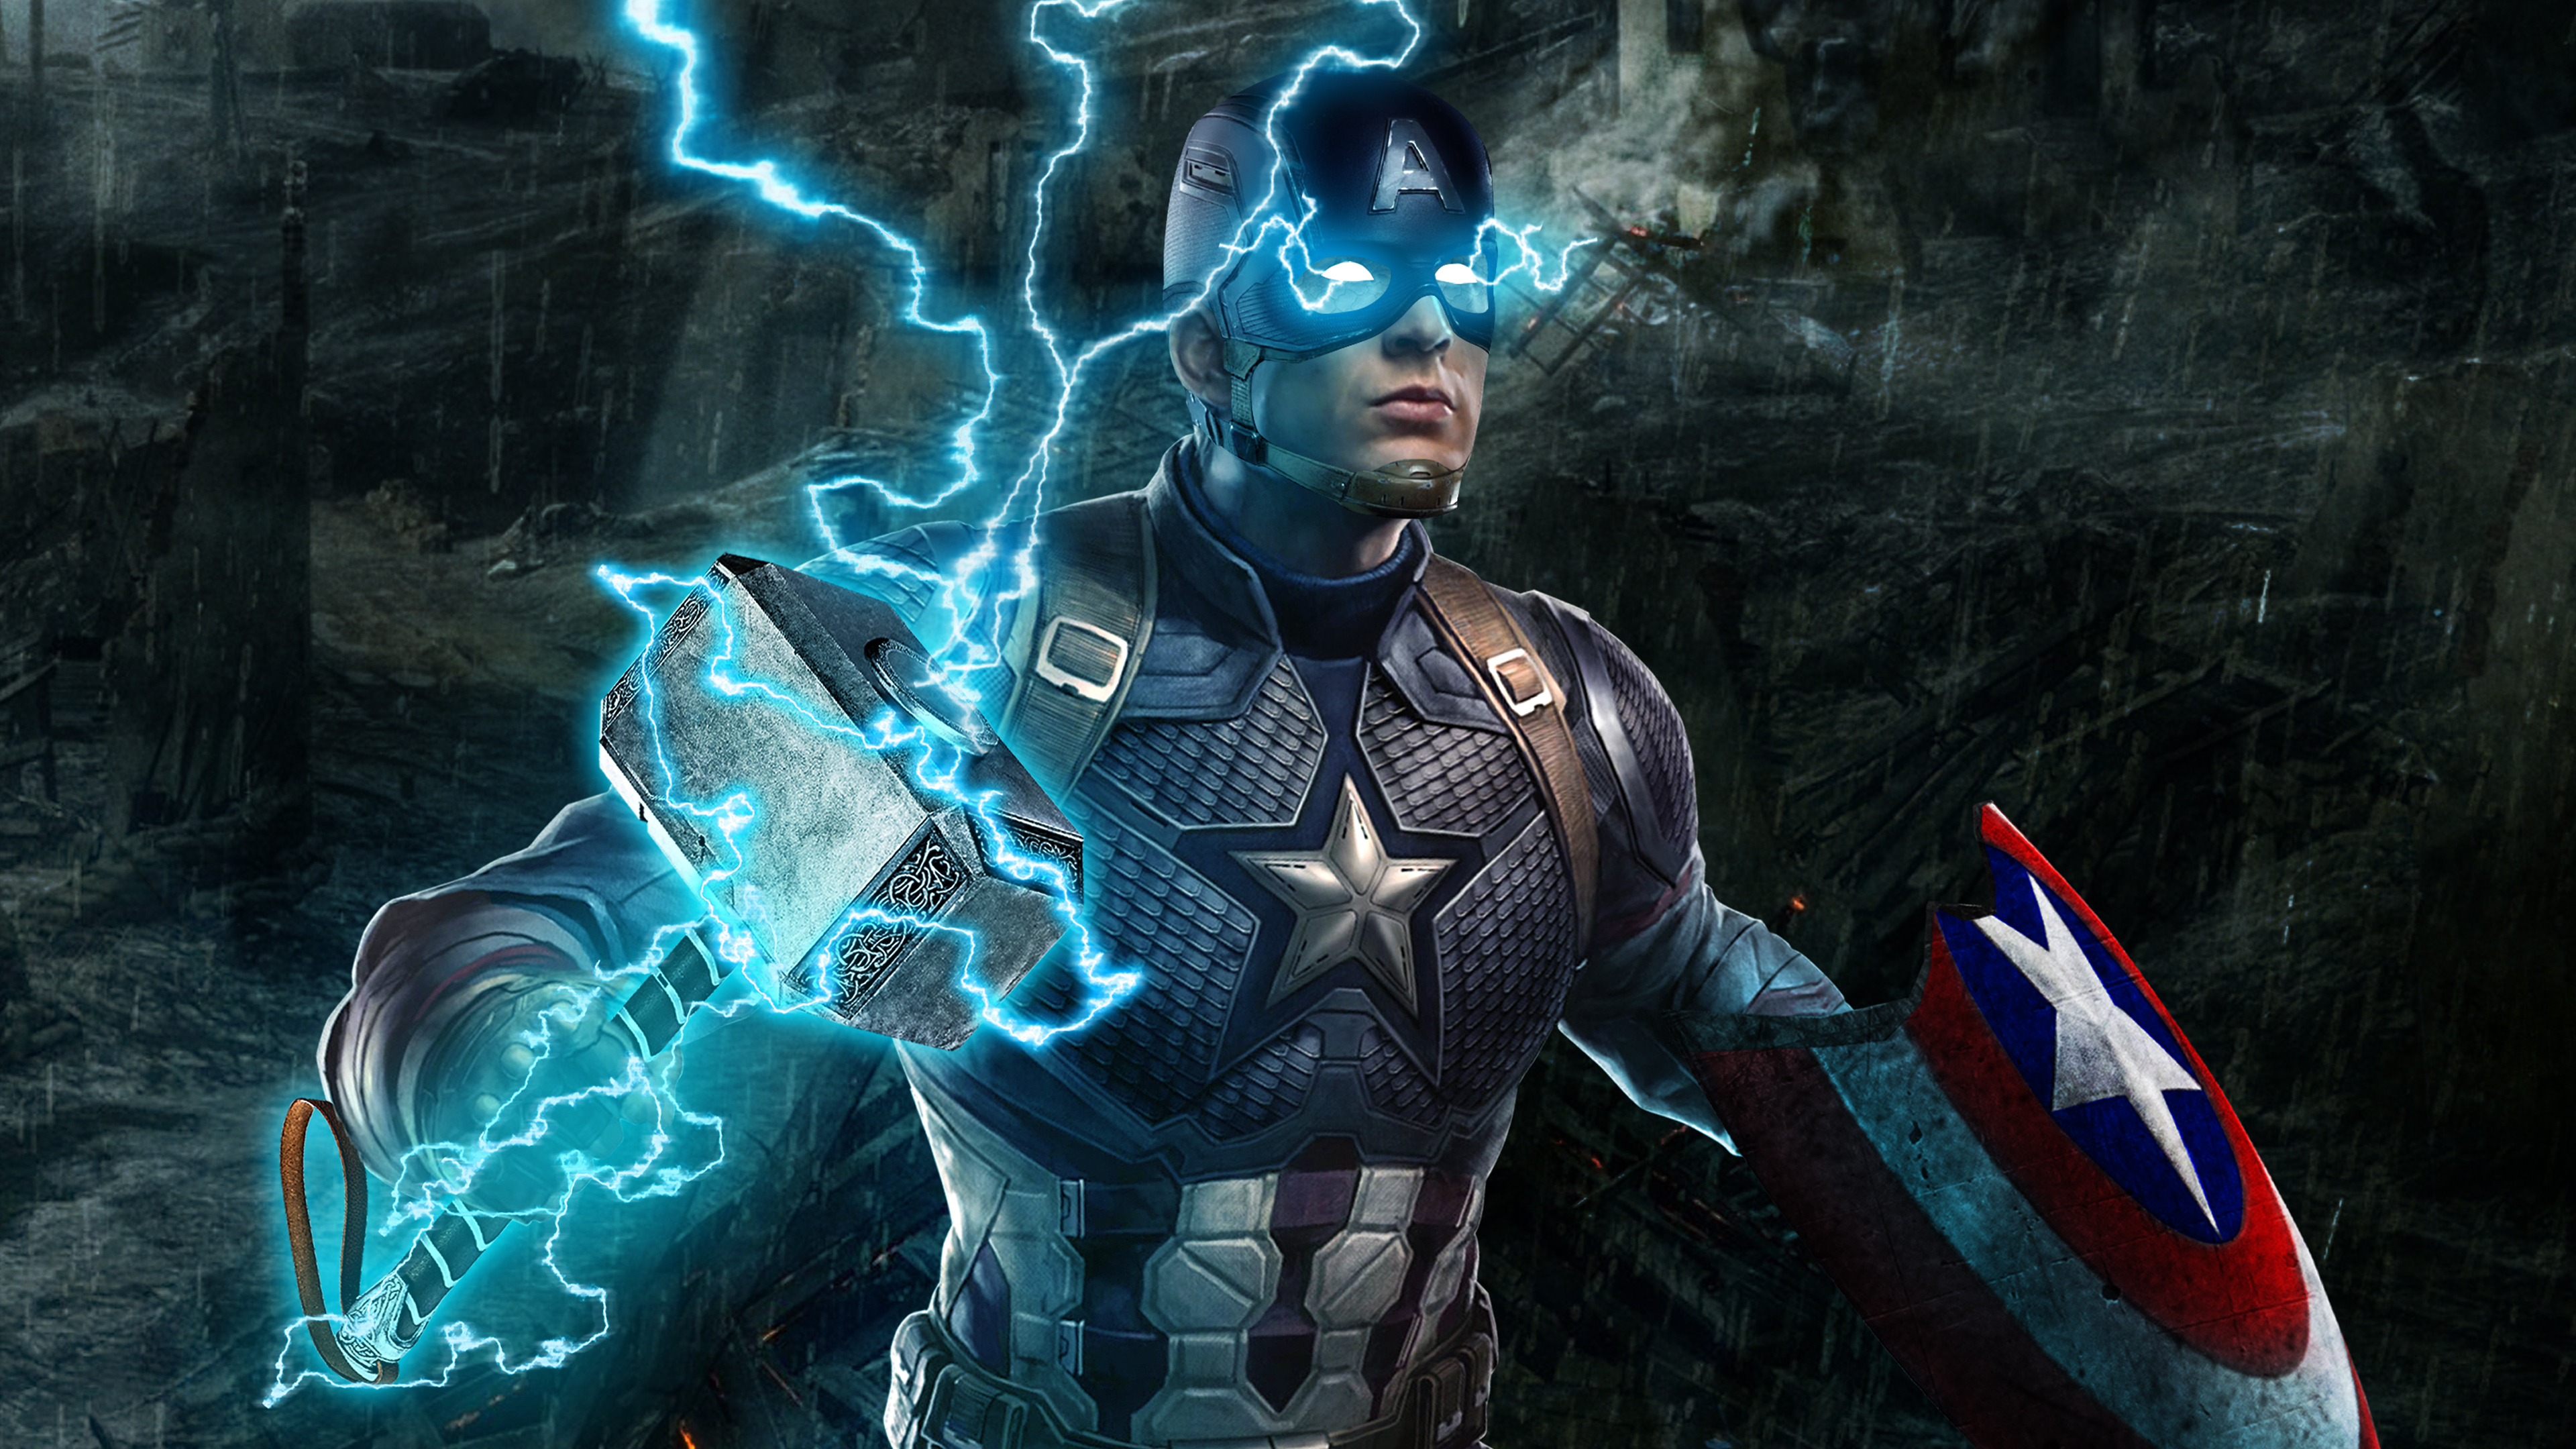 Captain America Avengers Endgame 4k Hd Superheroes 4k Wallpapers